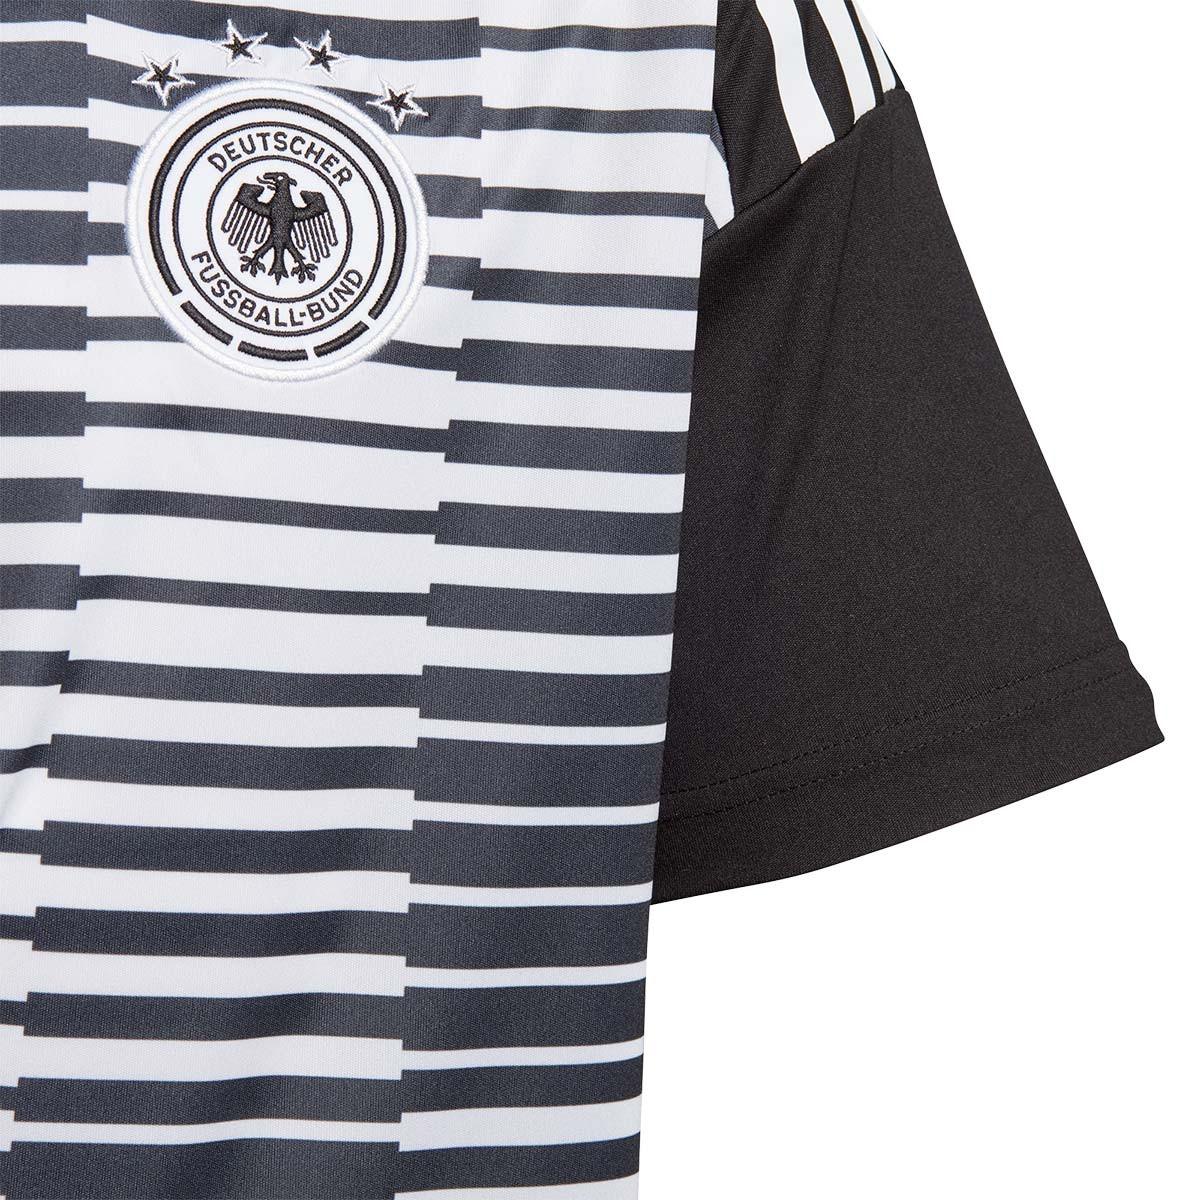 687b15daec1 Jersey adidas Kids Germany Pre-Match 2017-2018 White-Black - Football store  Fútbol Emotion